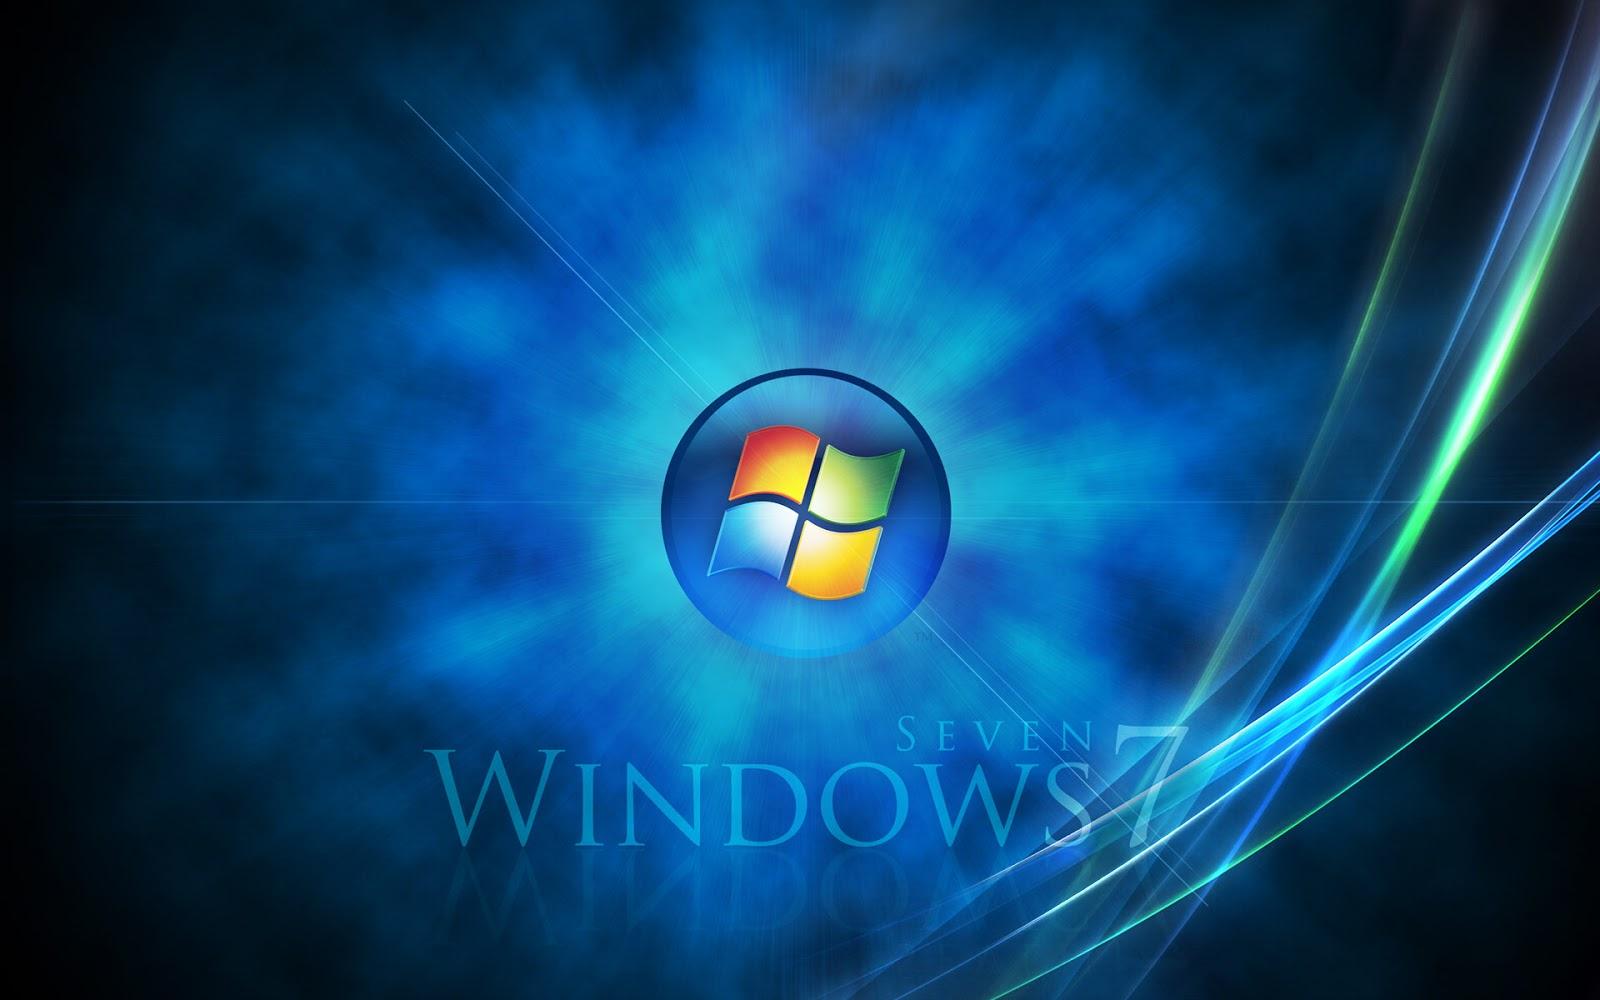 Wallpaper windows 7 full hd download wallpaper win 7 - Windows 7 love wallpapers ...